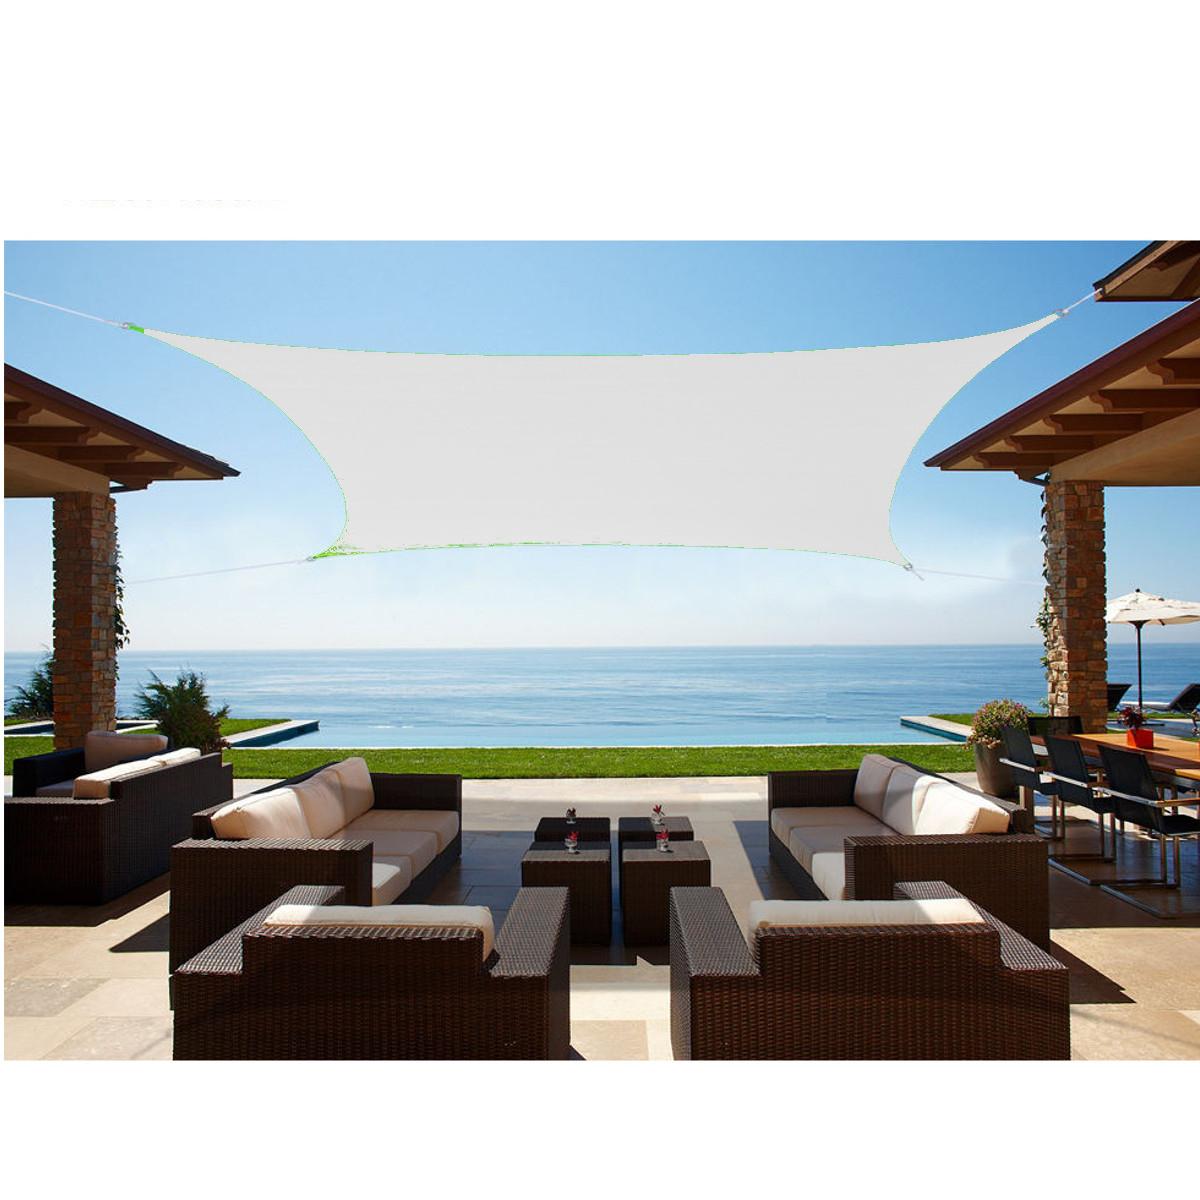 2/3/3.6/4M Sun Shade Sail Outdoor Canopy Patio UV Block Garden Shelter Triangle Rectangle Cover